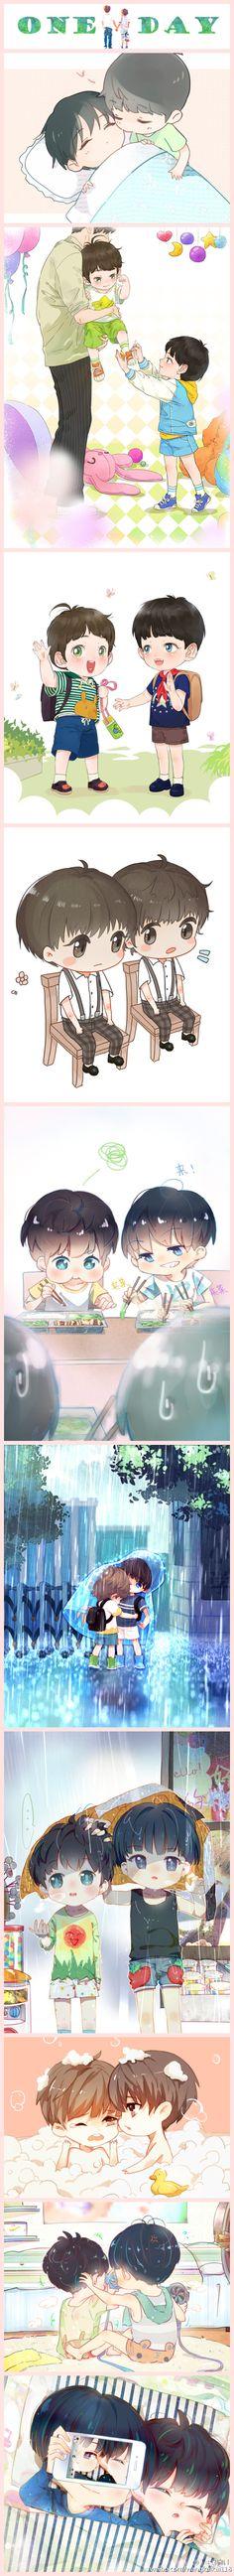 丨王凯凯丨 's Weibo_Weibo